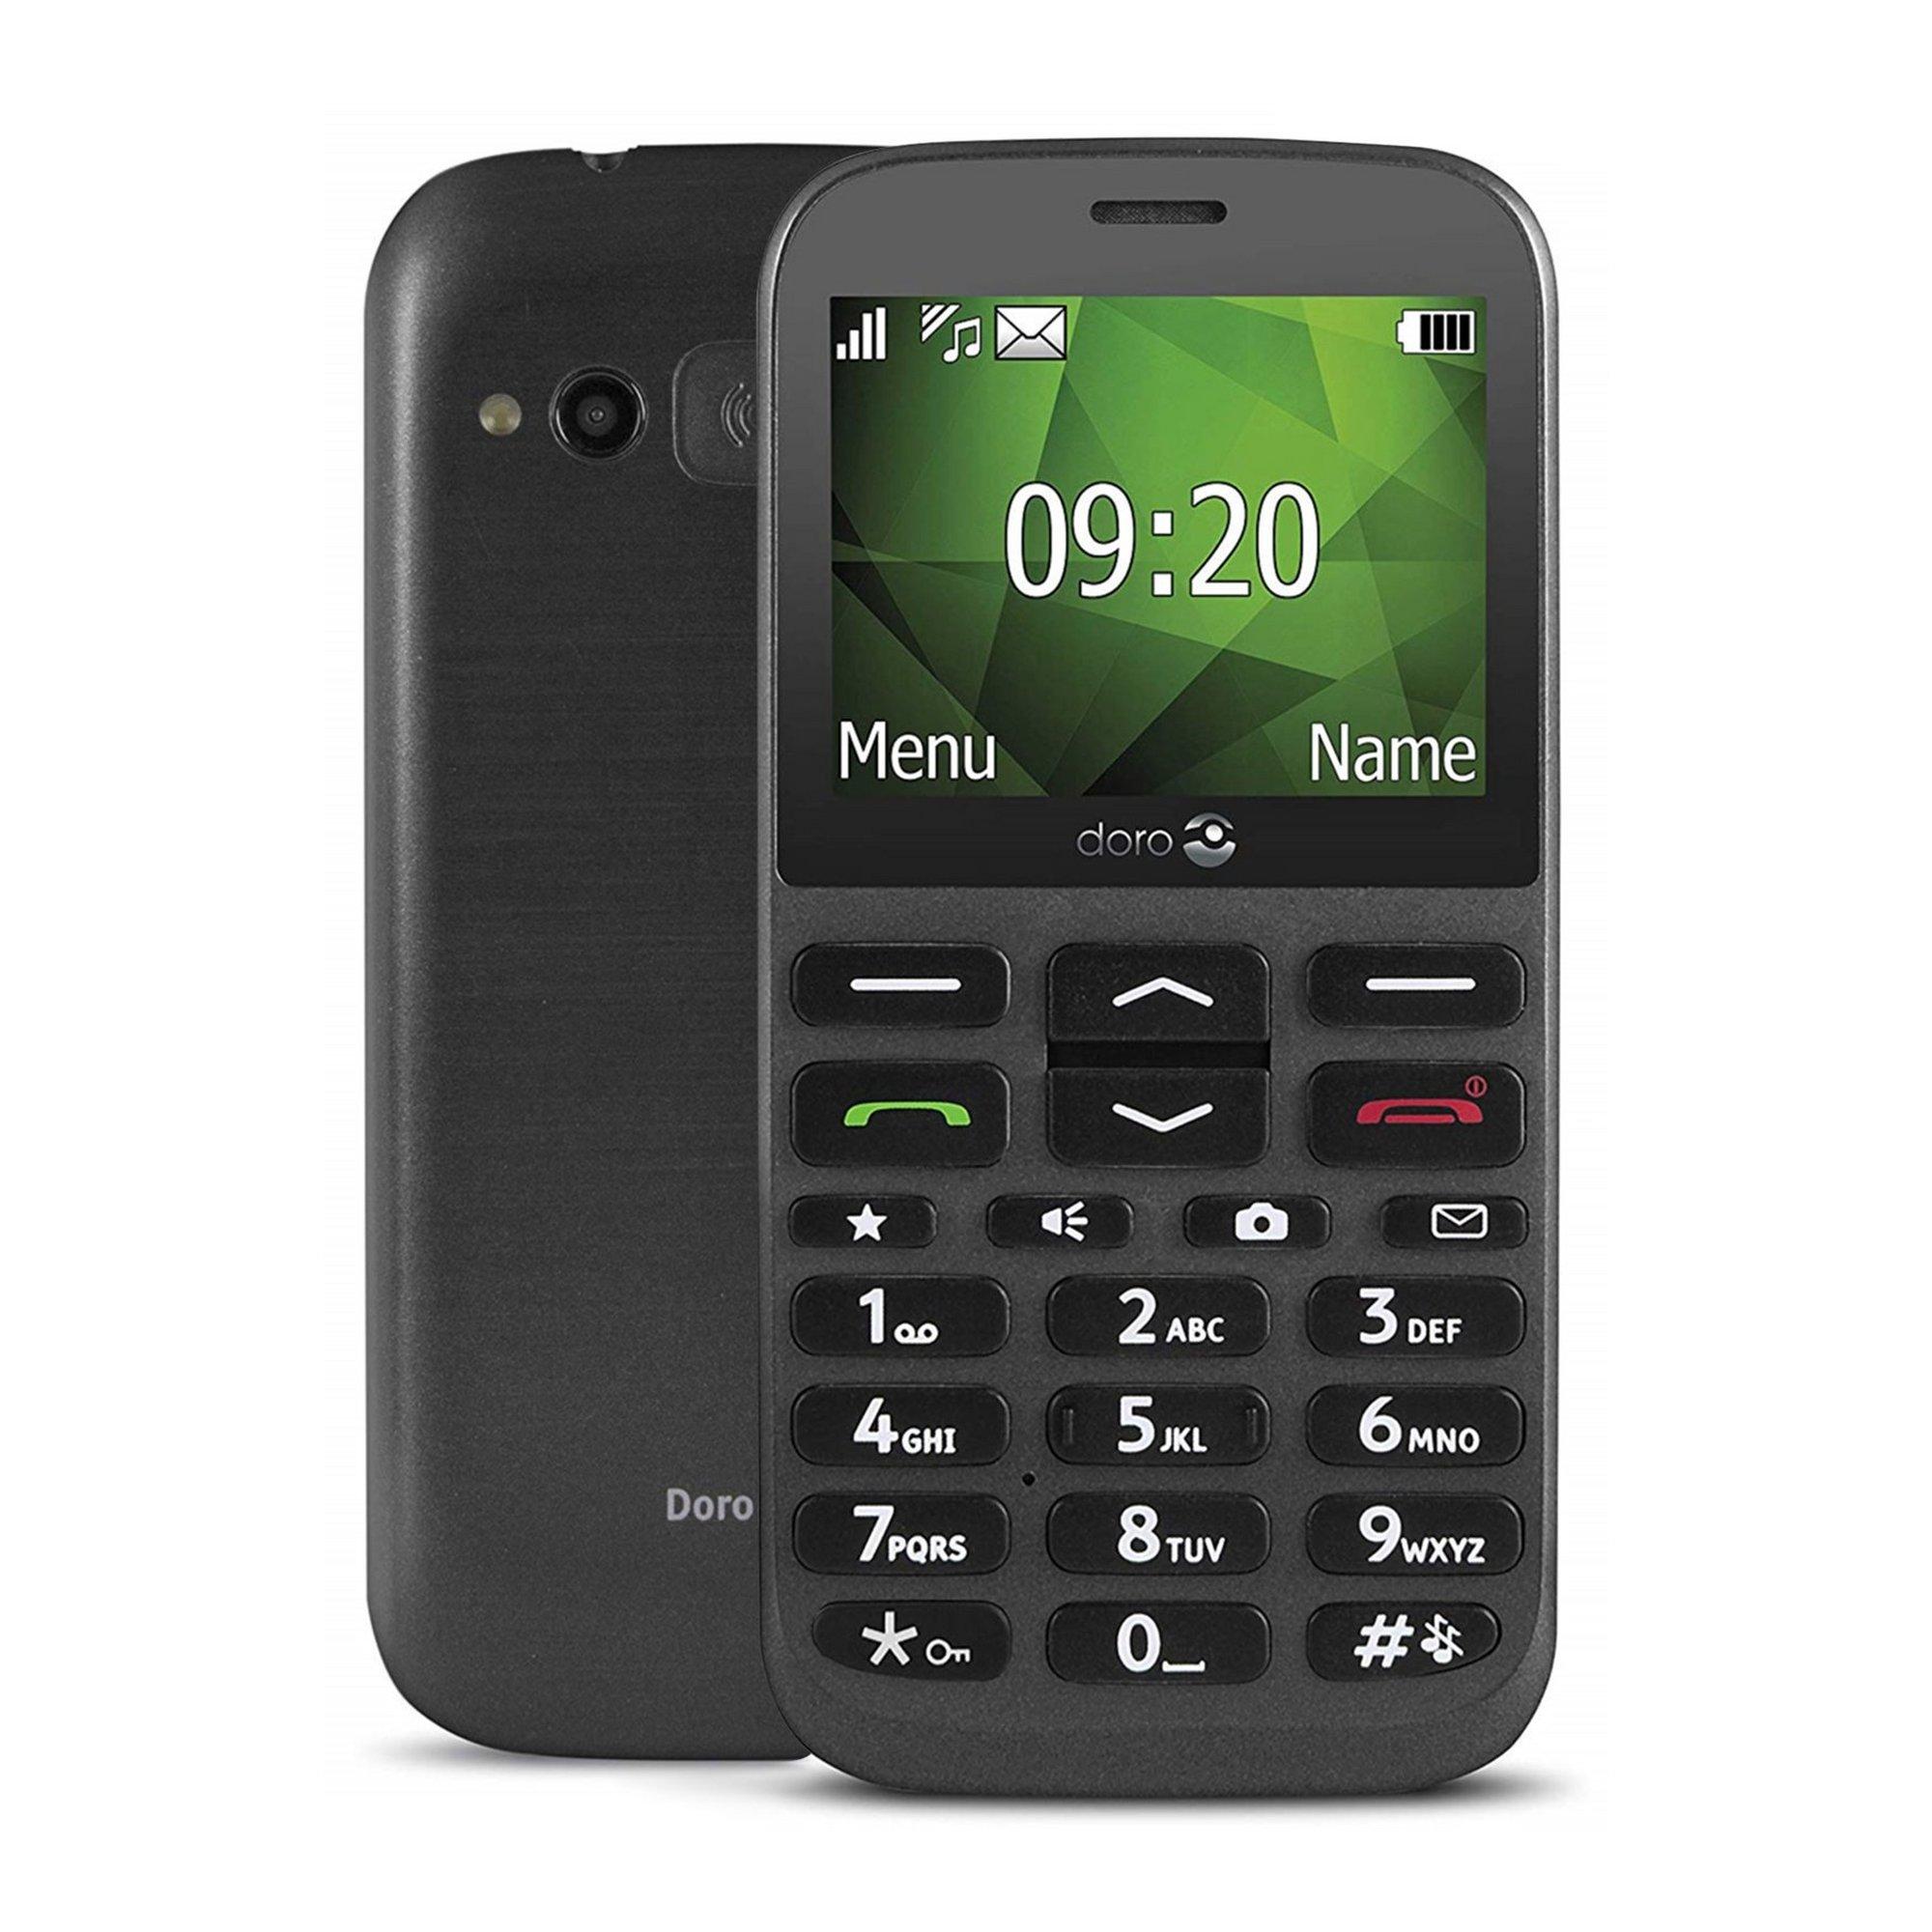 Image of SIM Free Doro 1370 Mobile Phone